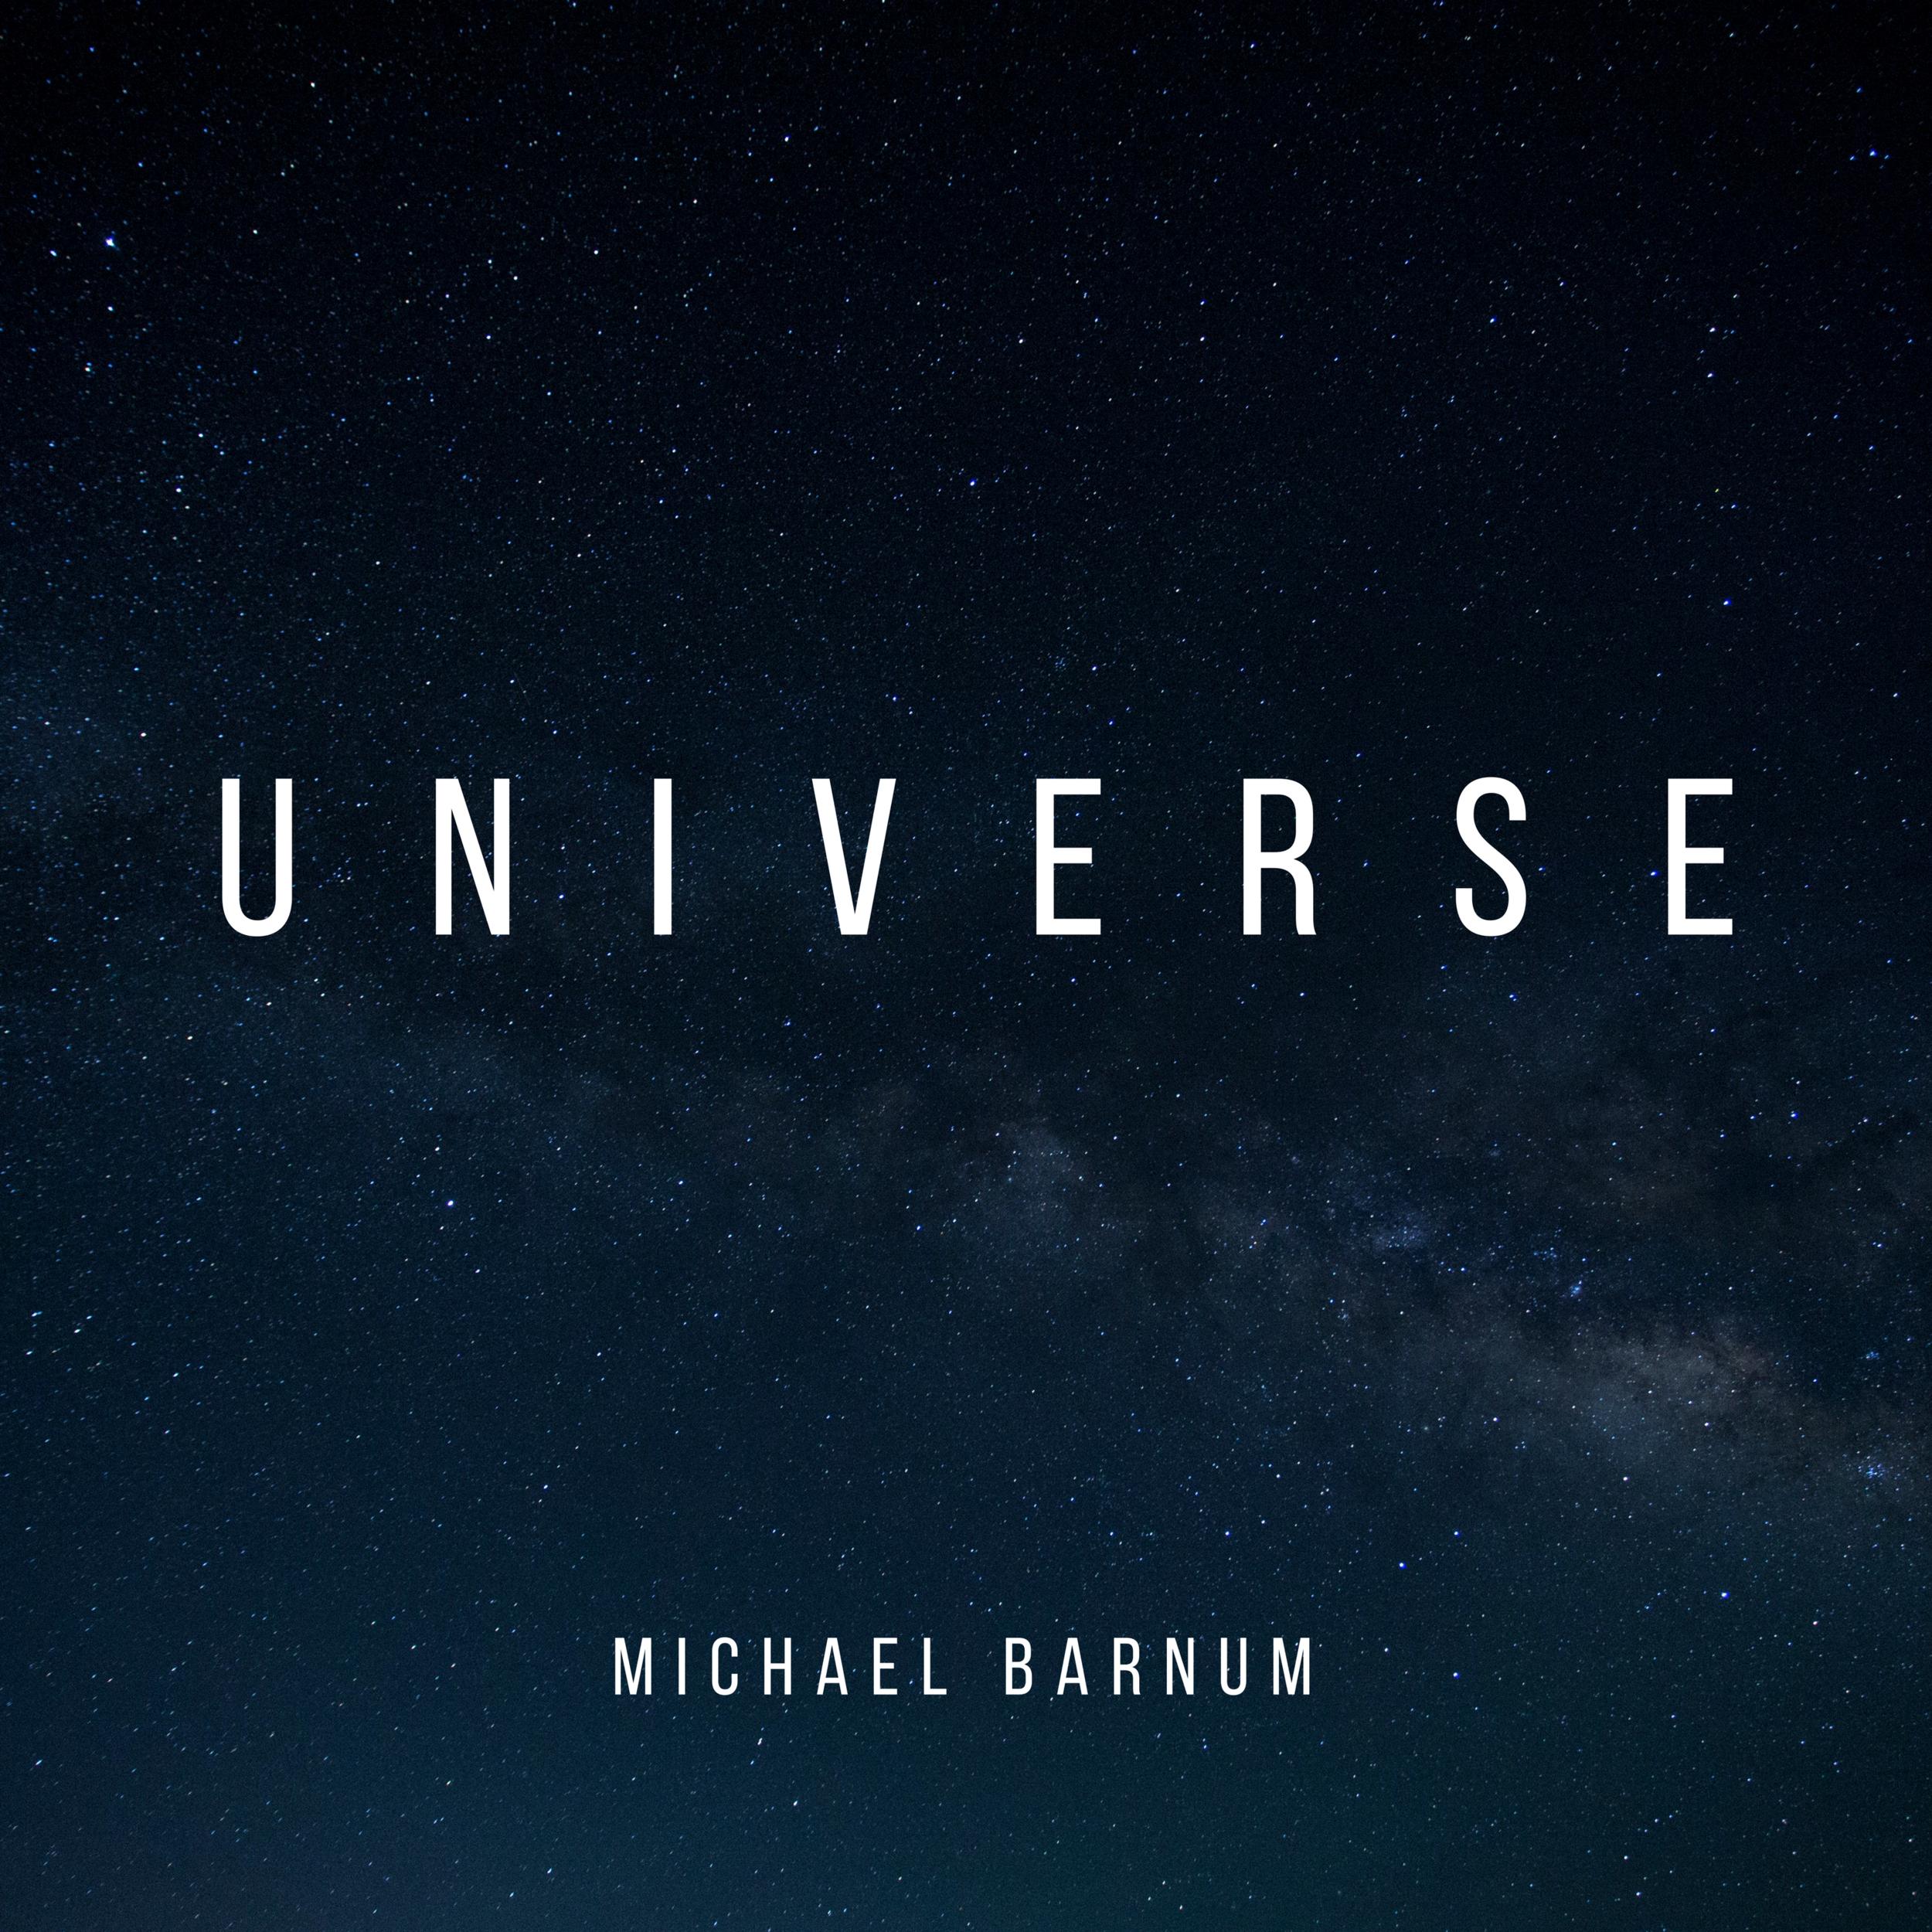 universe album artwork_FINAL.png